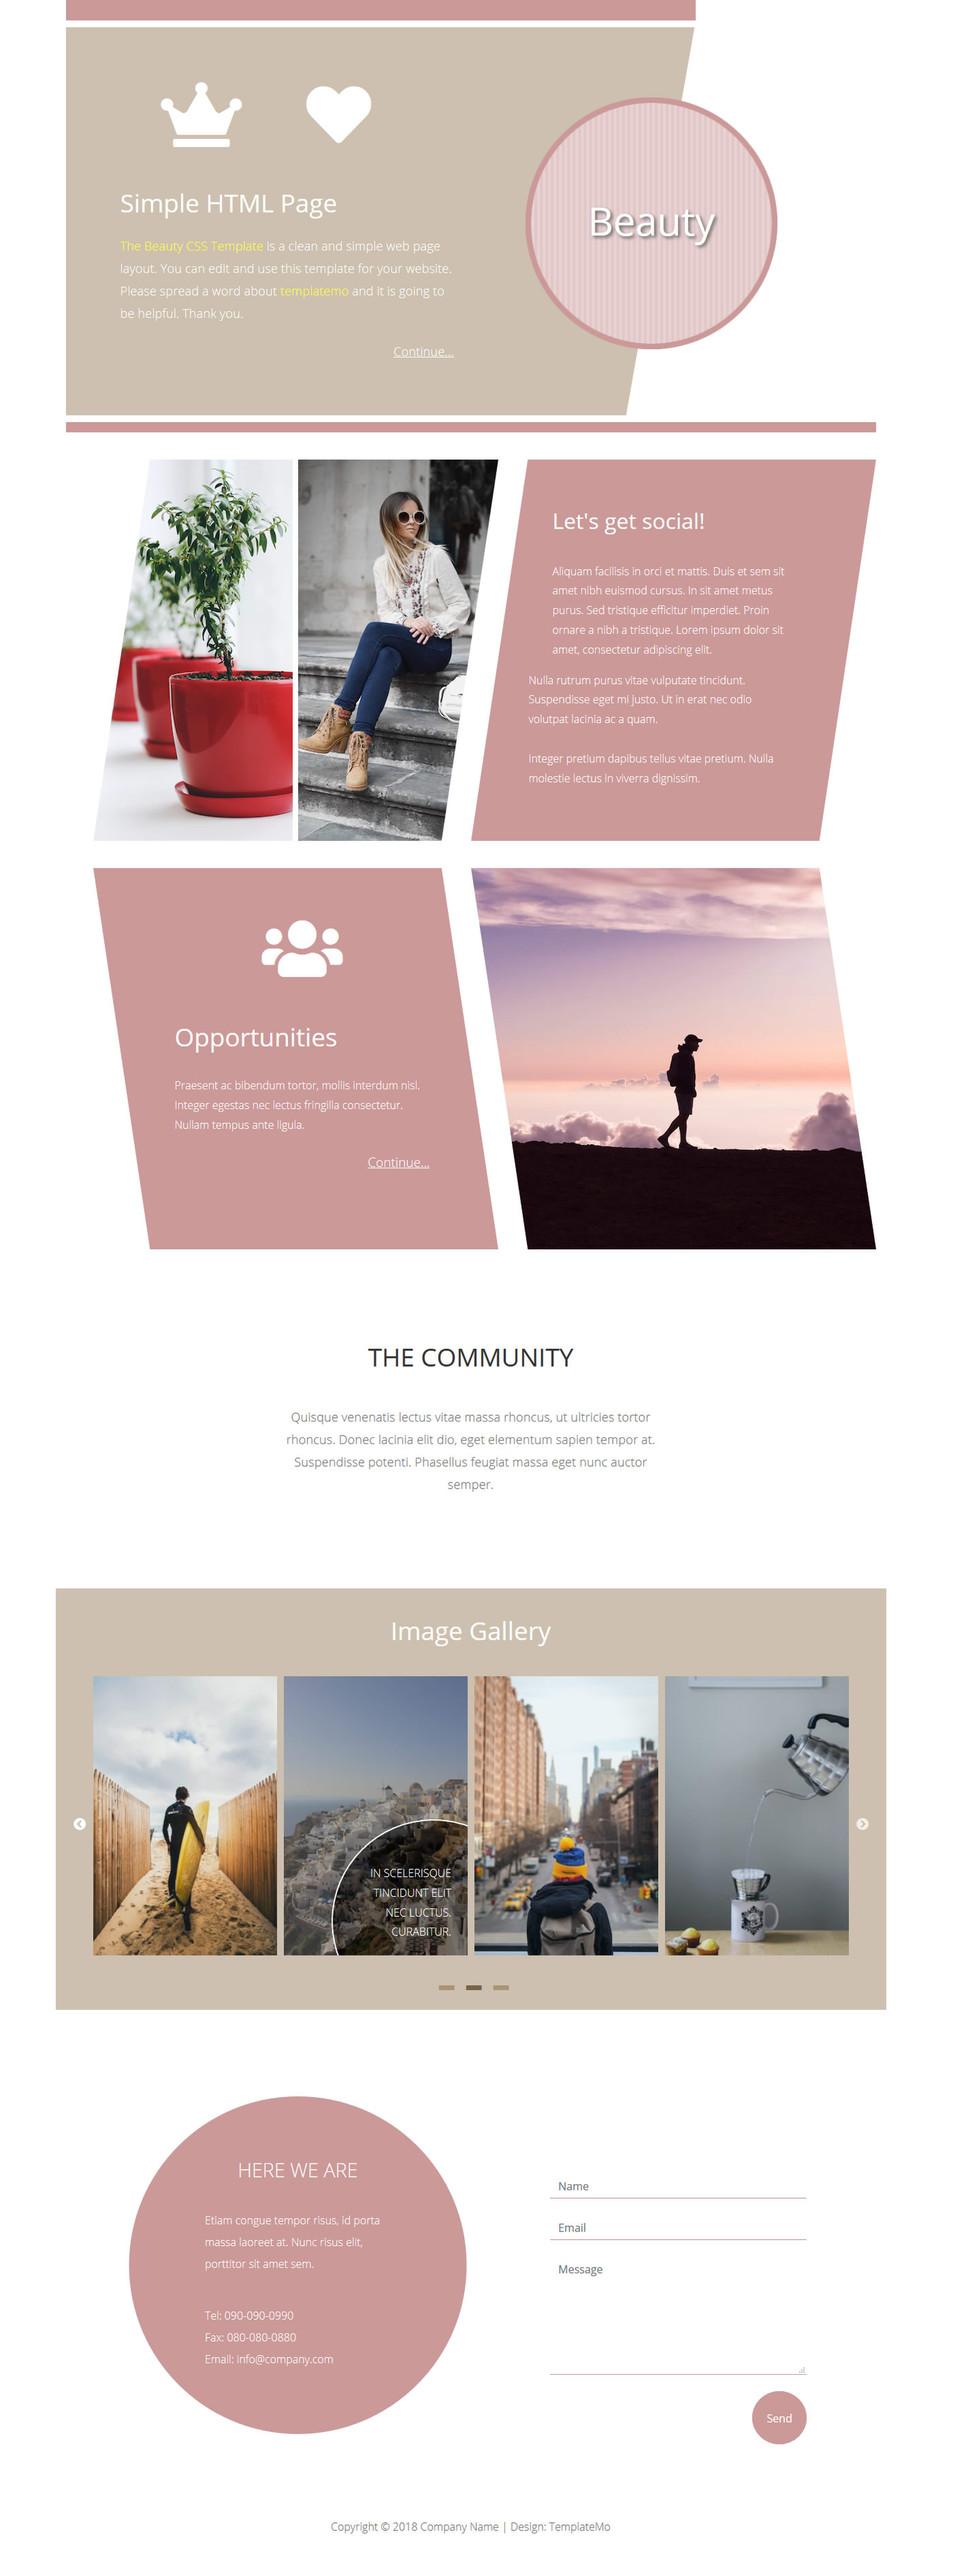 Ücretsiz Beauty HTML Şablonu